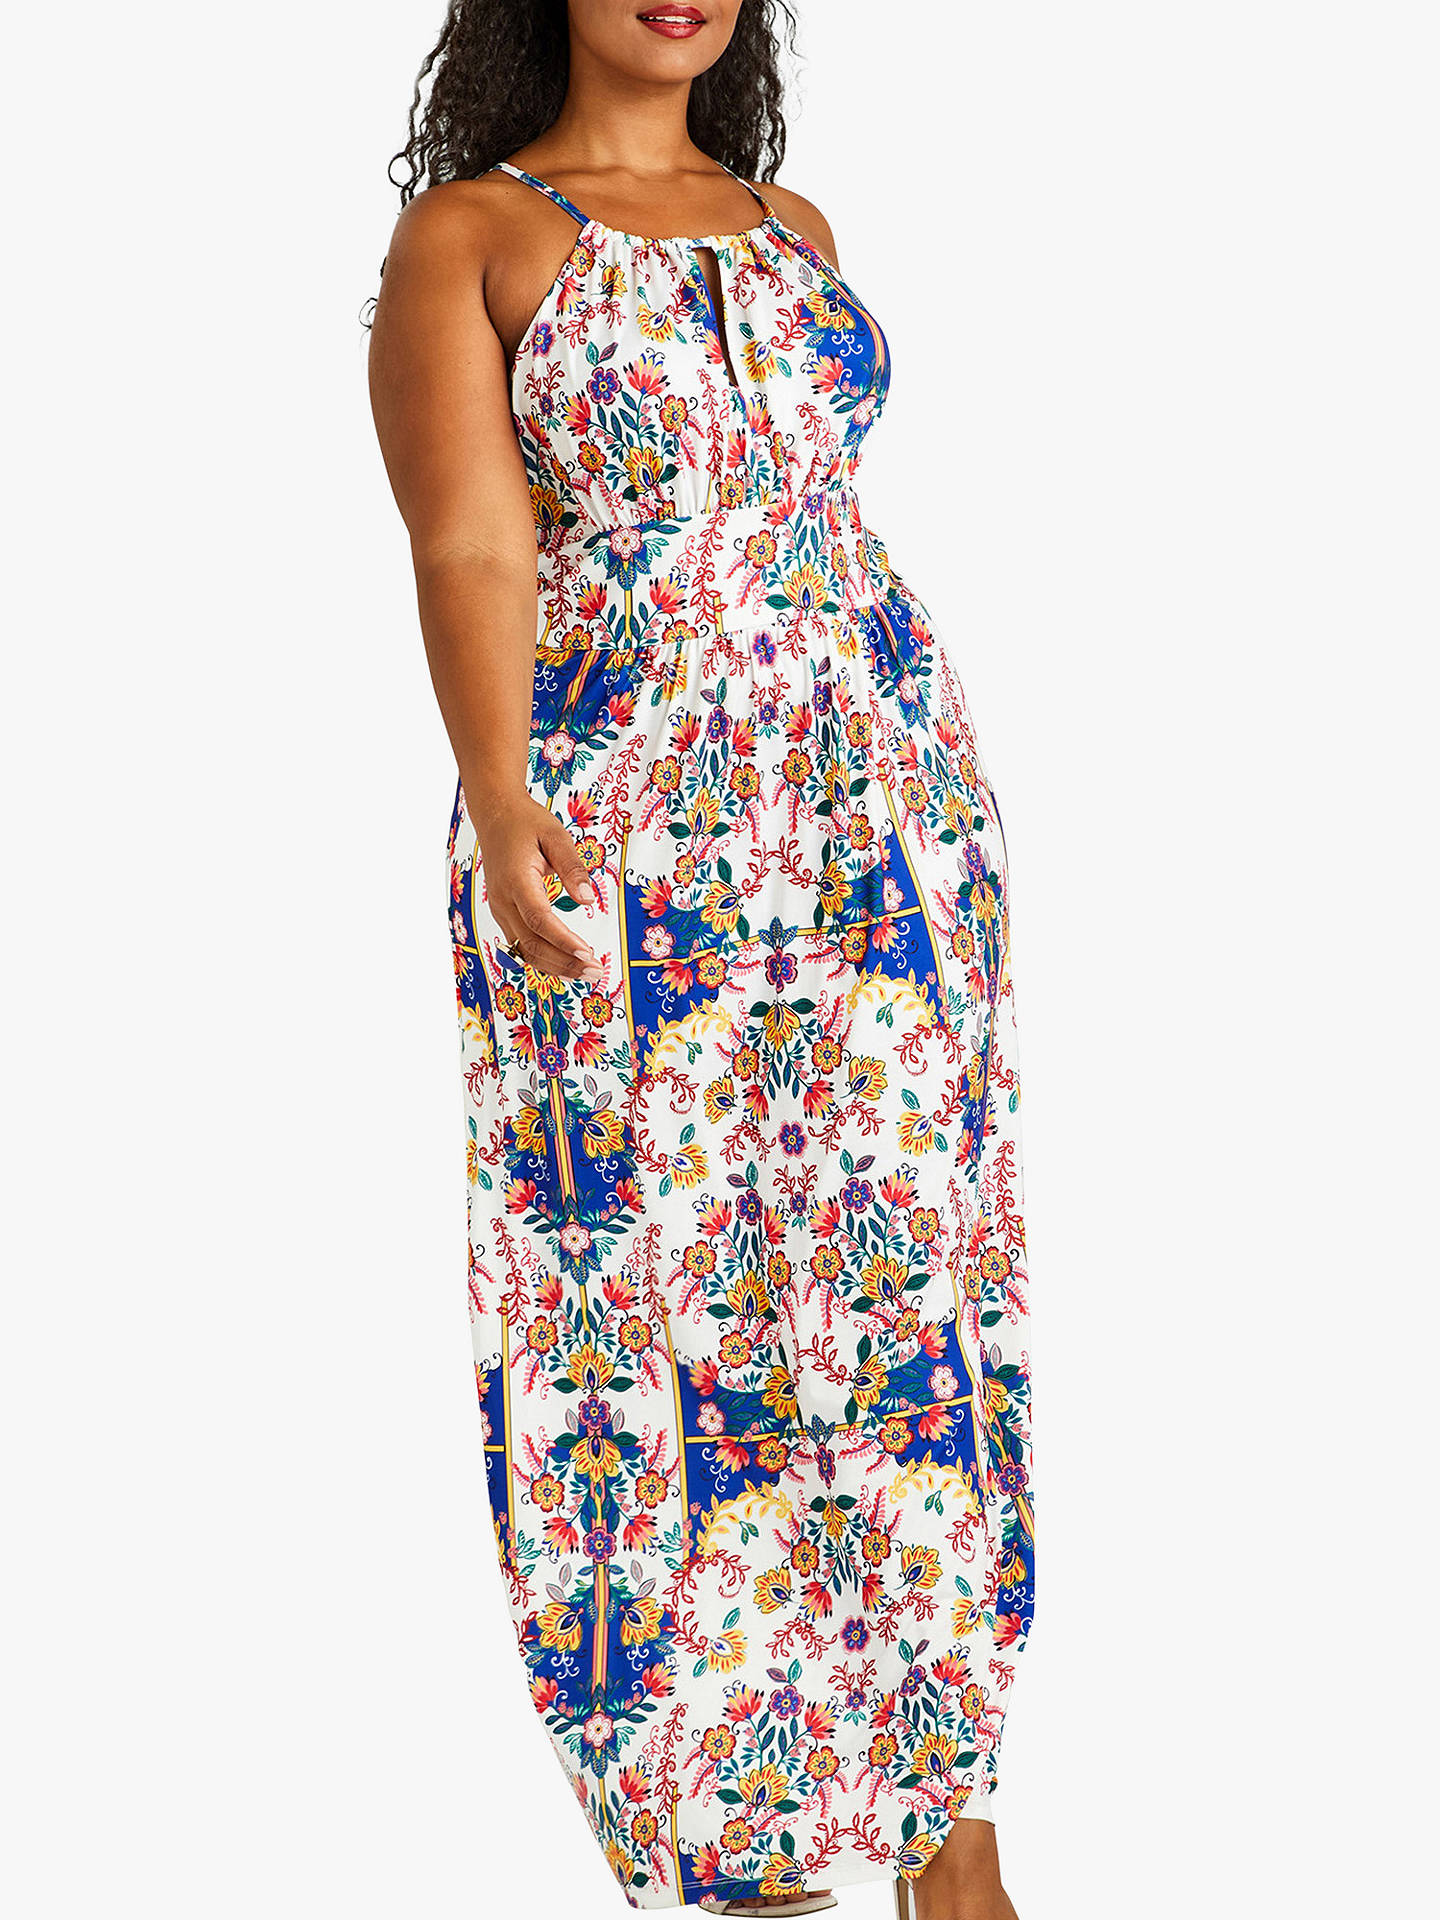 366eabecf5e Buy Yumi Curves Mexican Print Maxi Dress